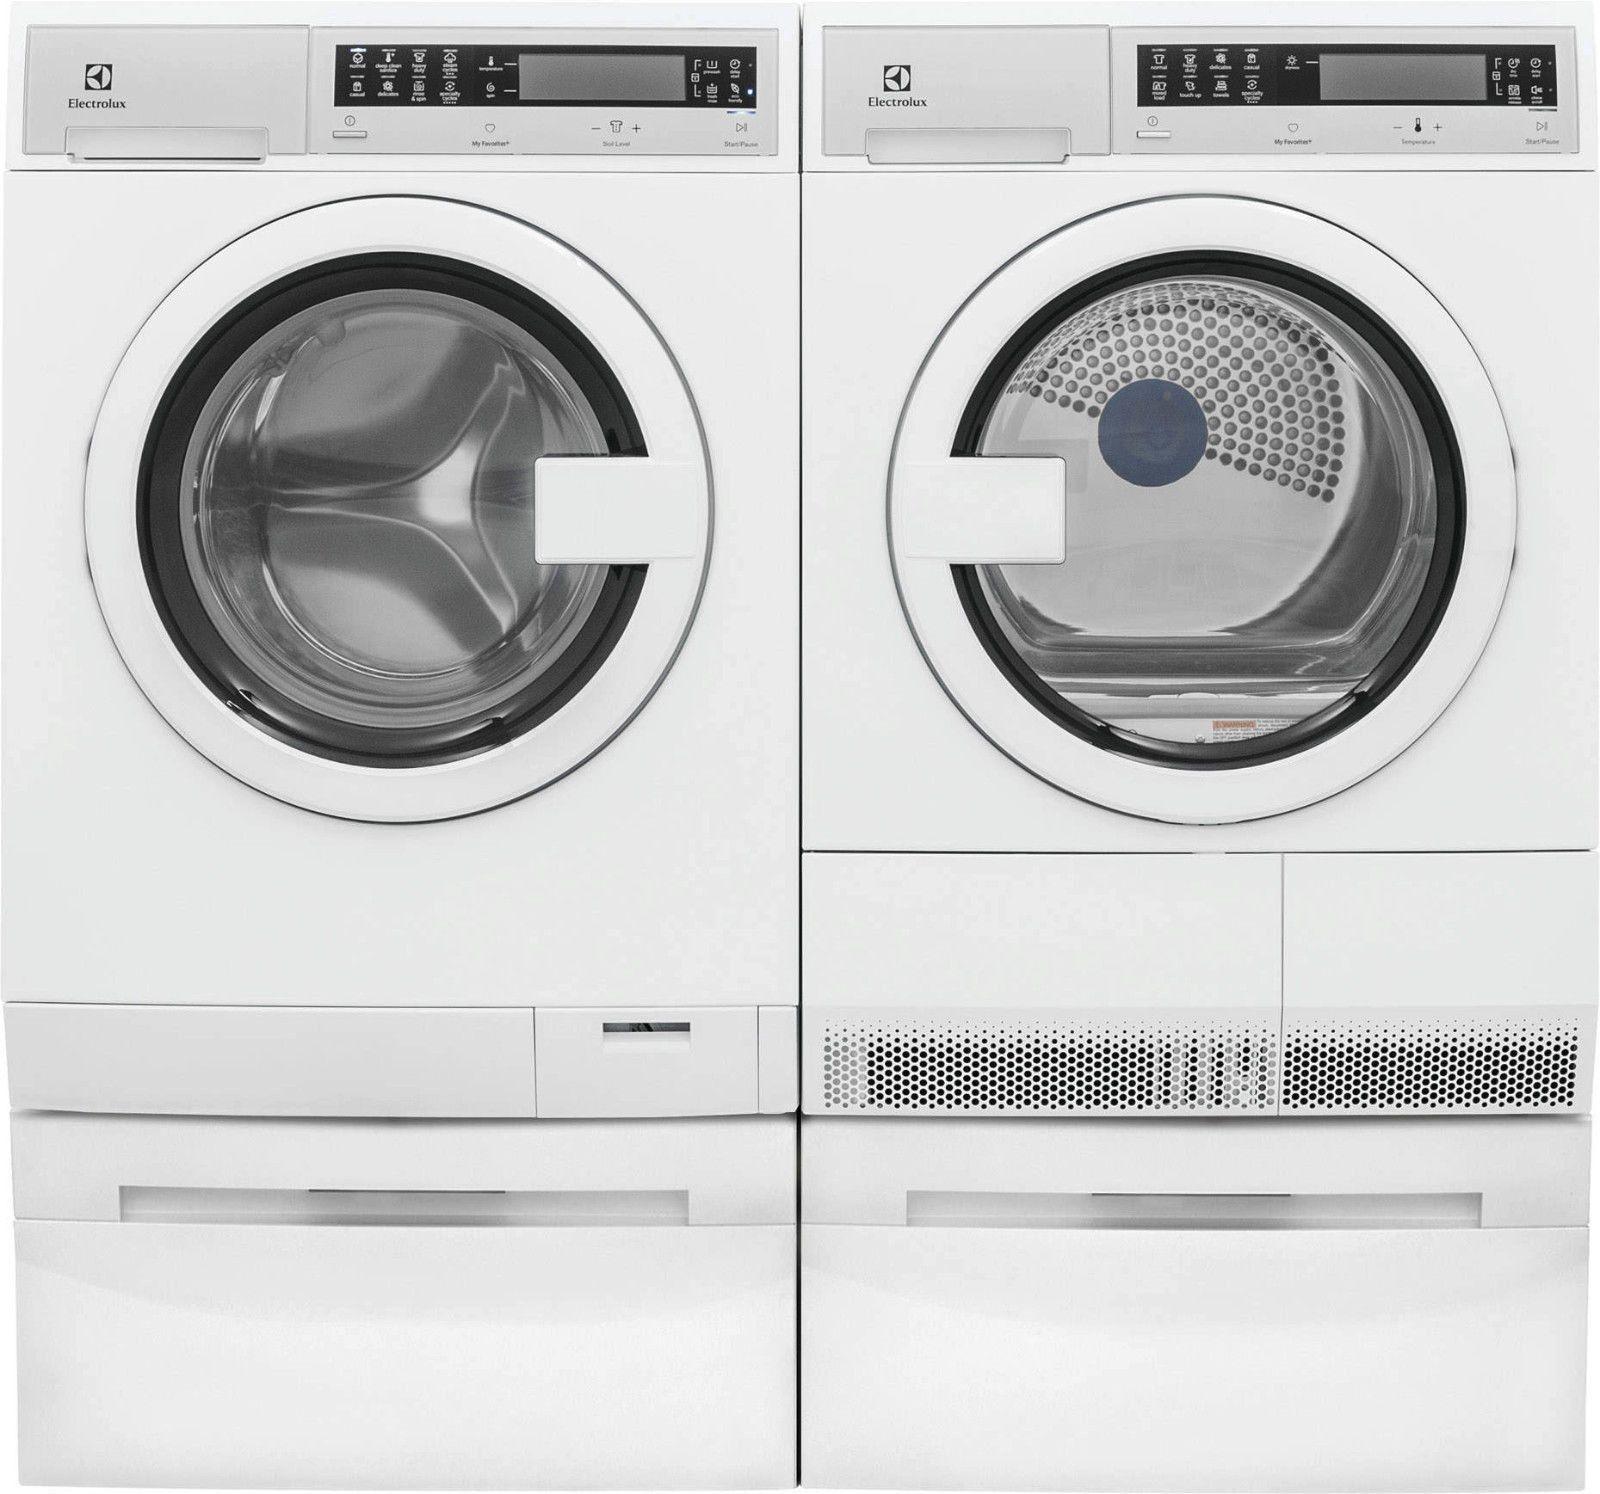 washerdryer id electrolux step dryer pedestal washer